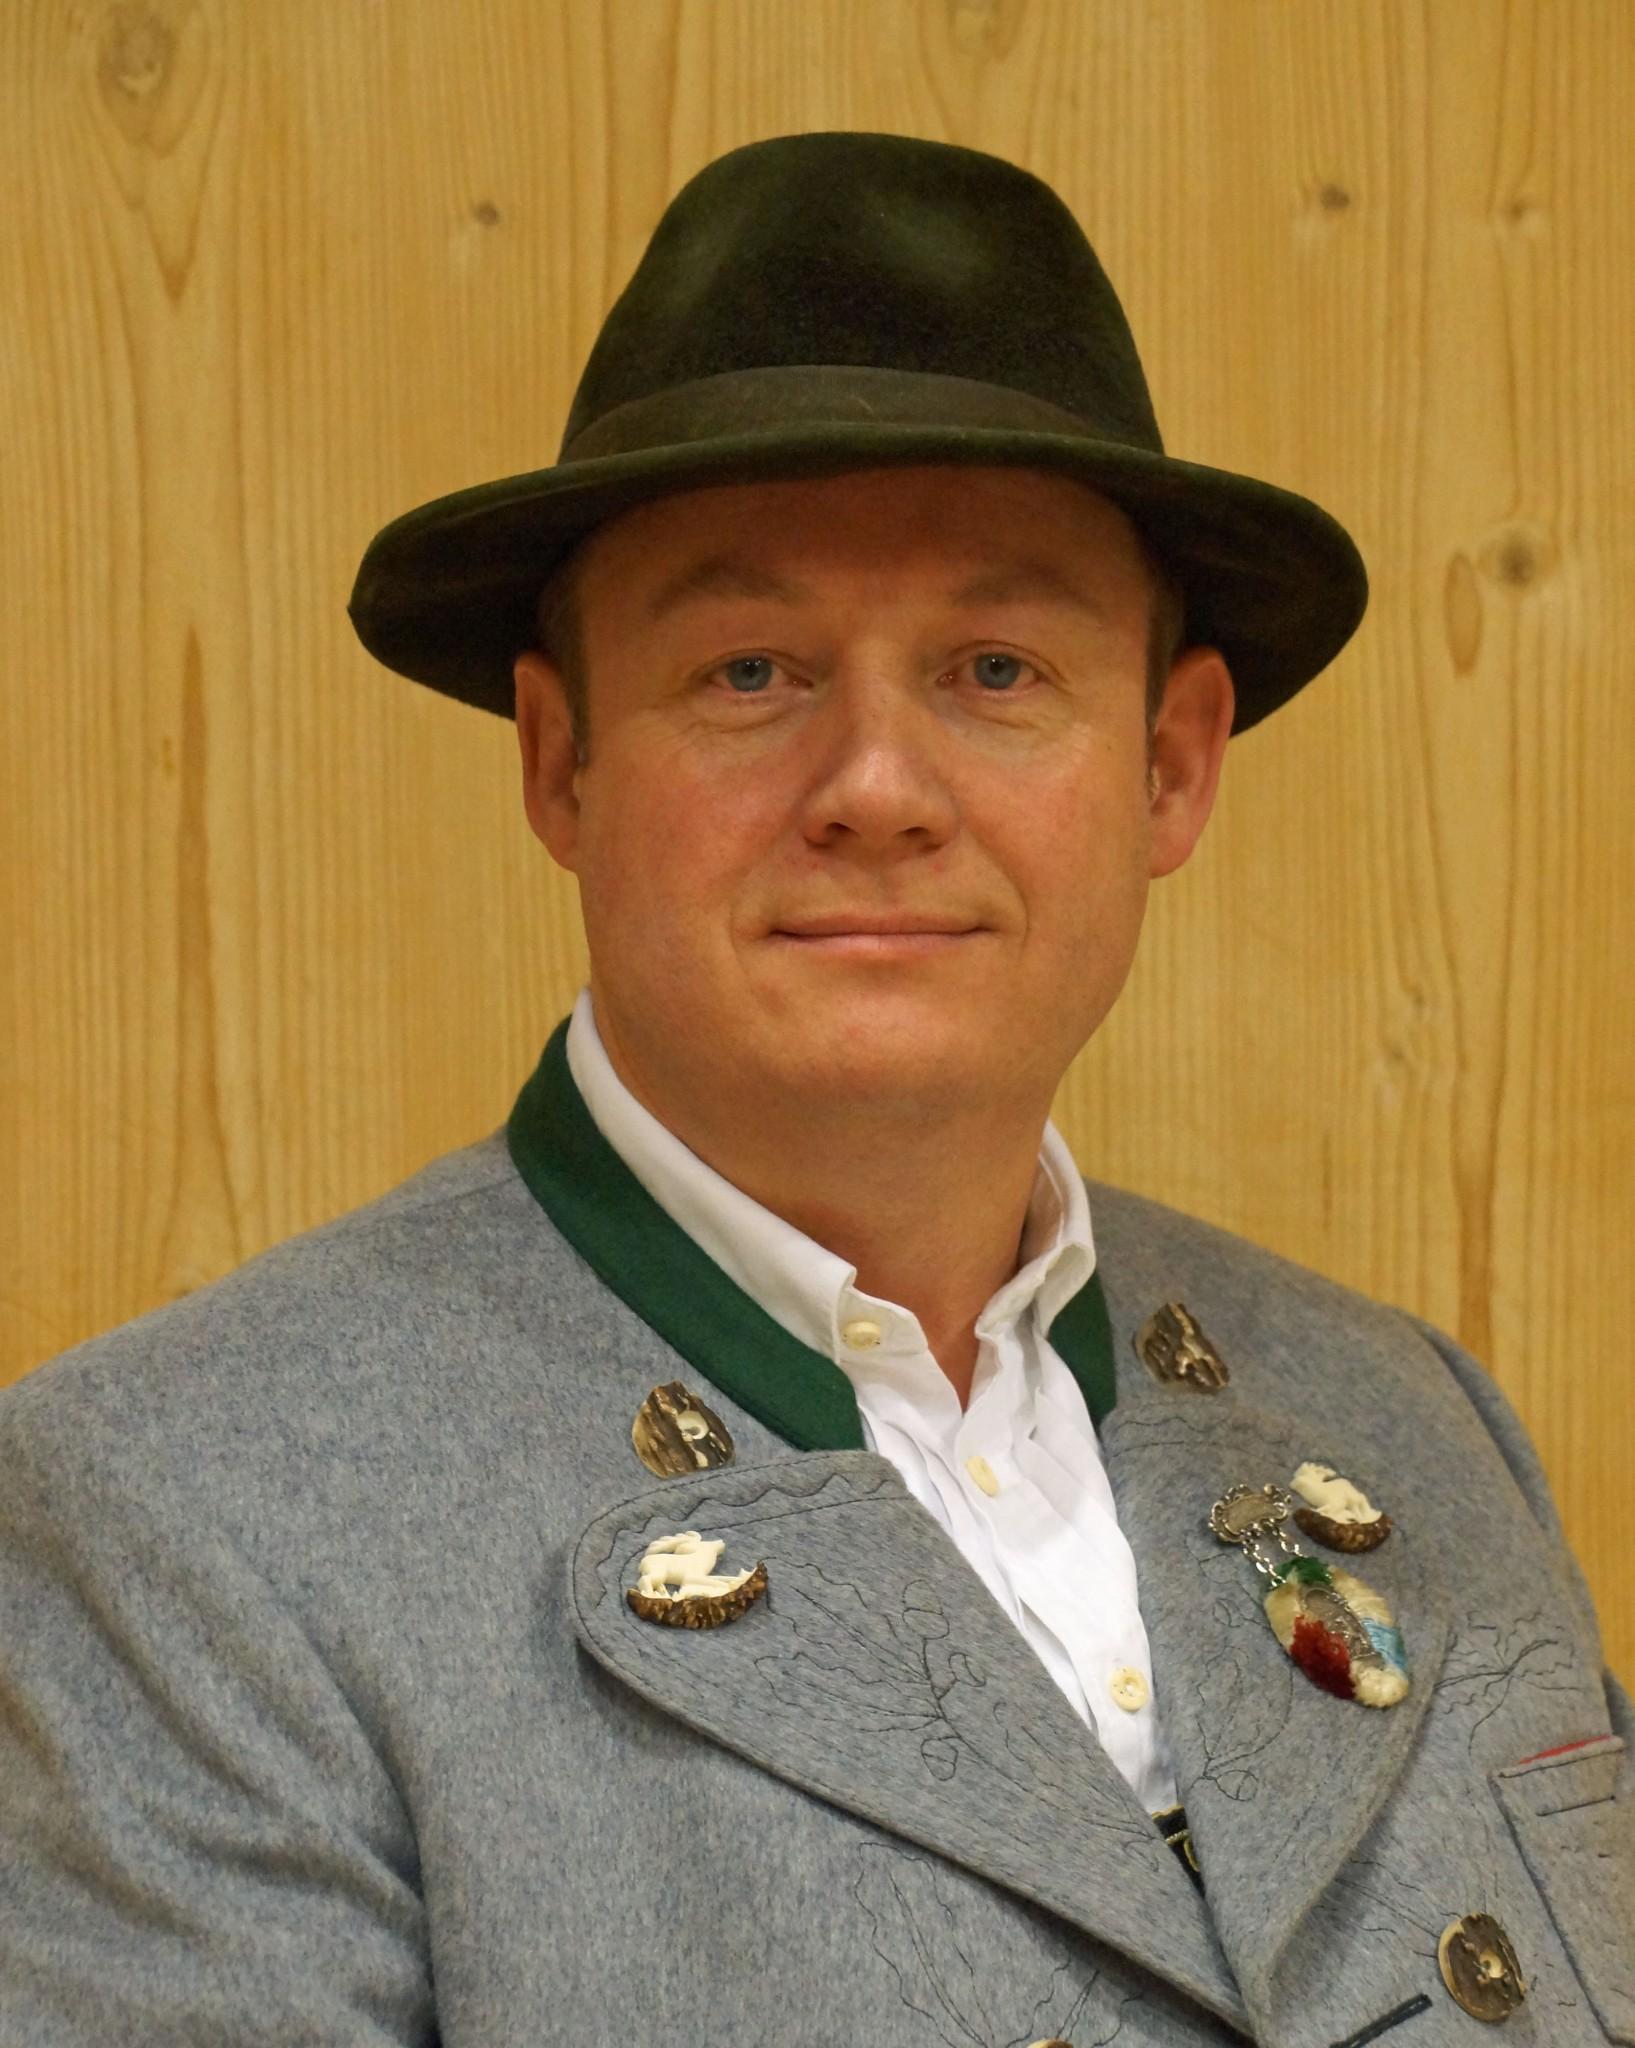 Christian-Kammerbauer